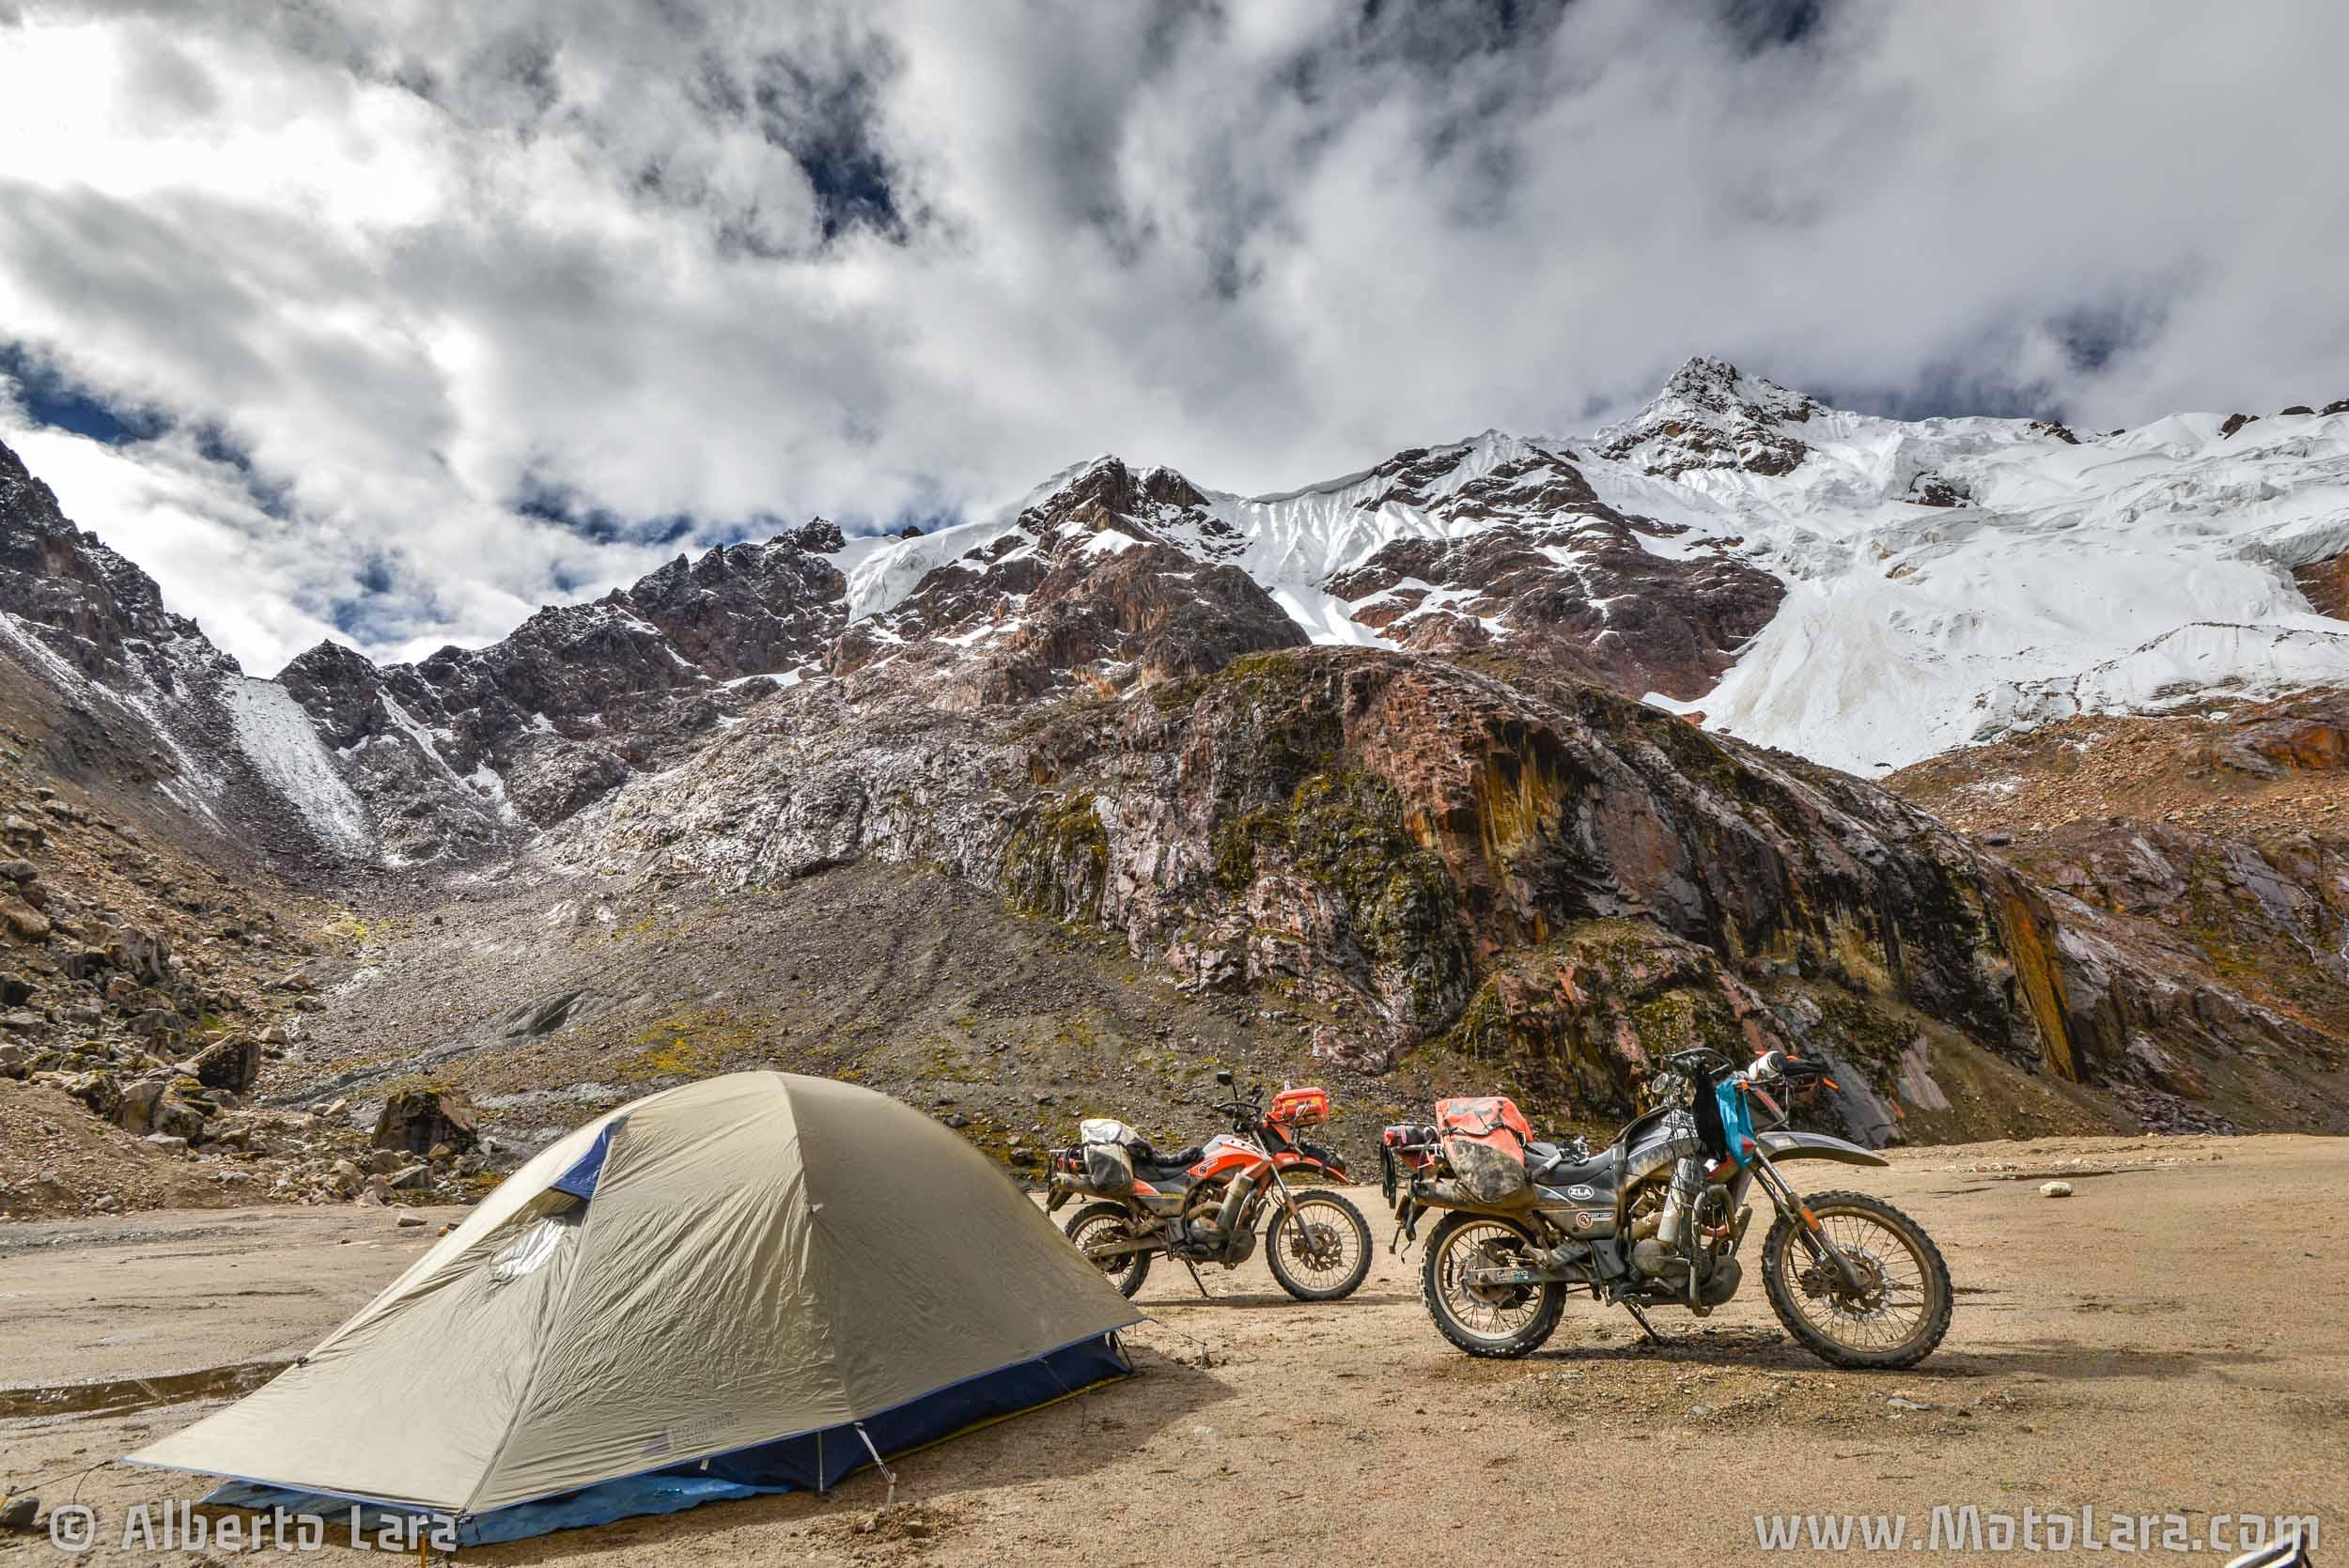 Camping @ 4,750 m near Punta Olimpica, Huascaran National Park.jpg